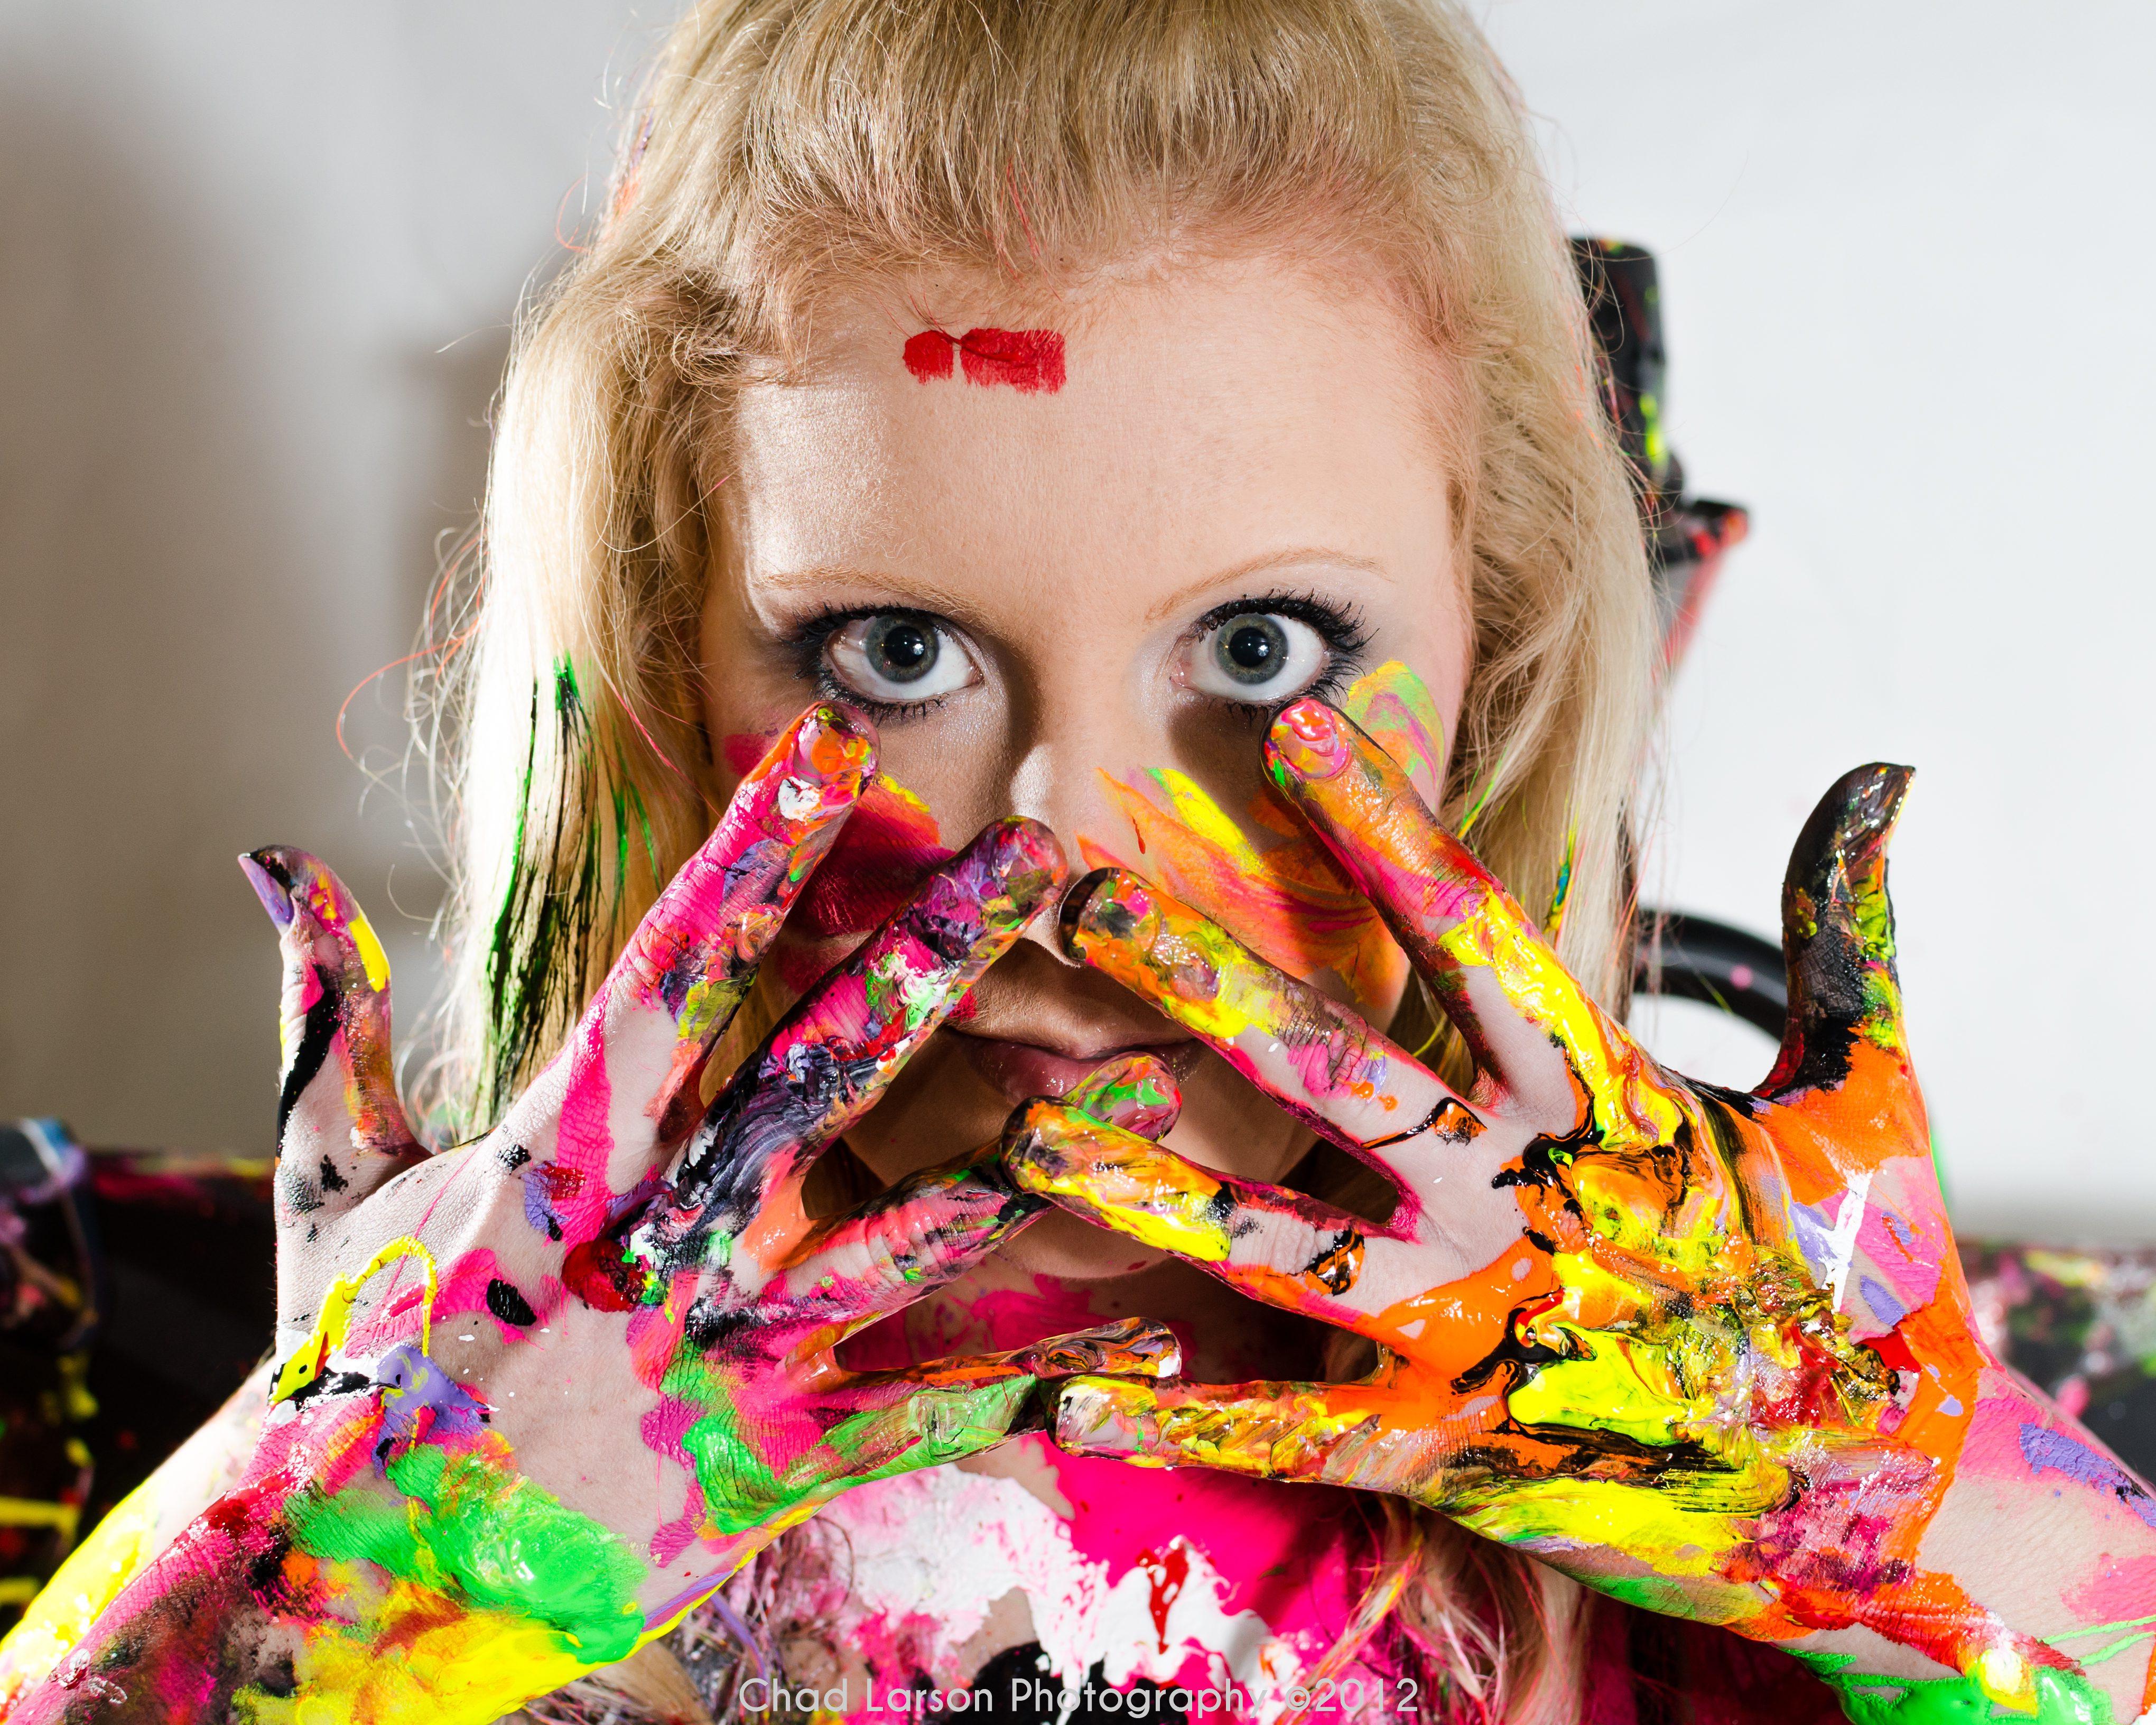 Danielle K. von Neupert's Portfolio